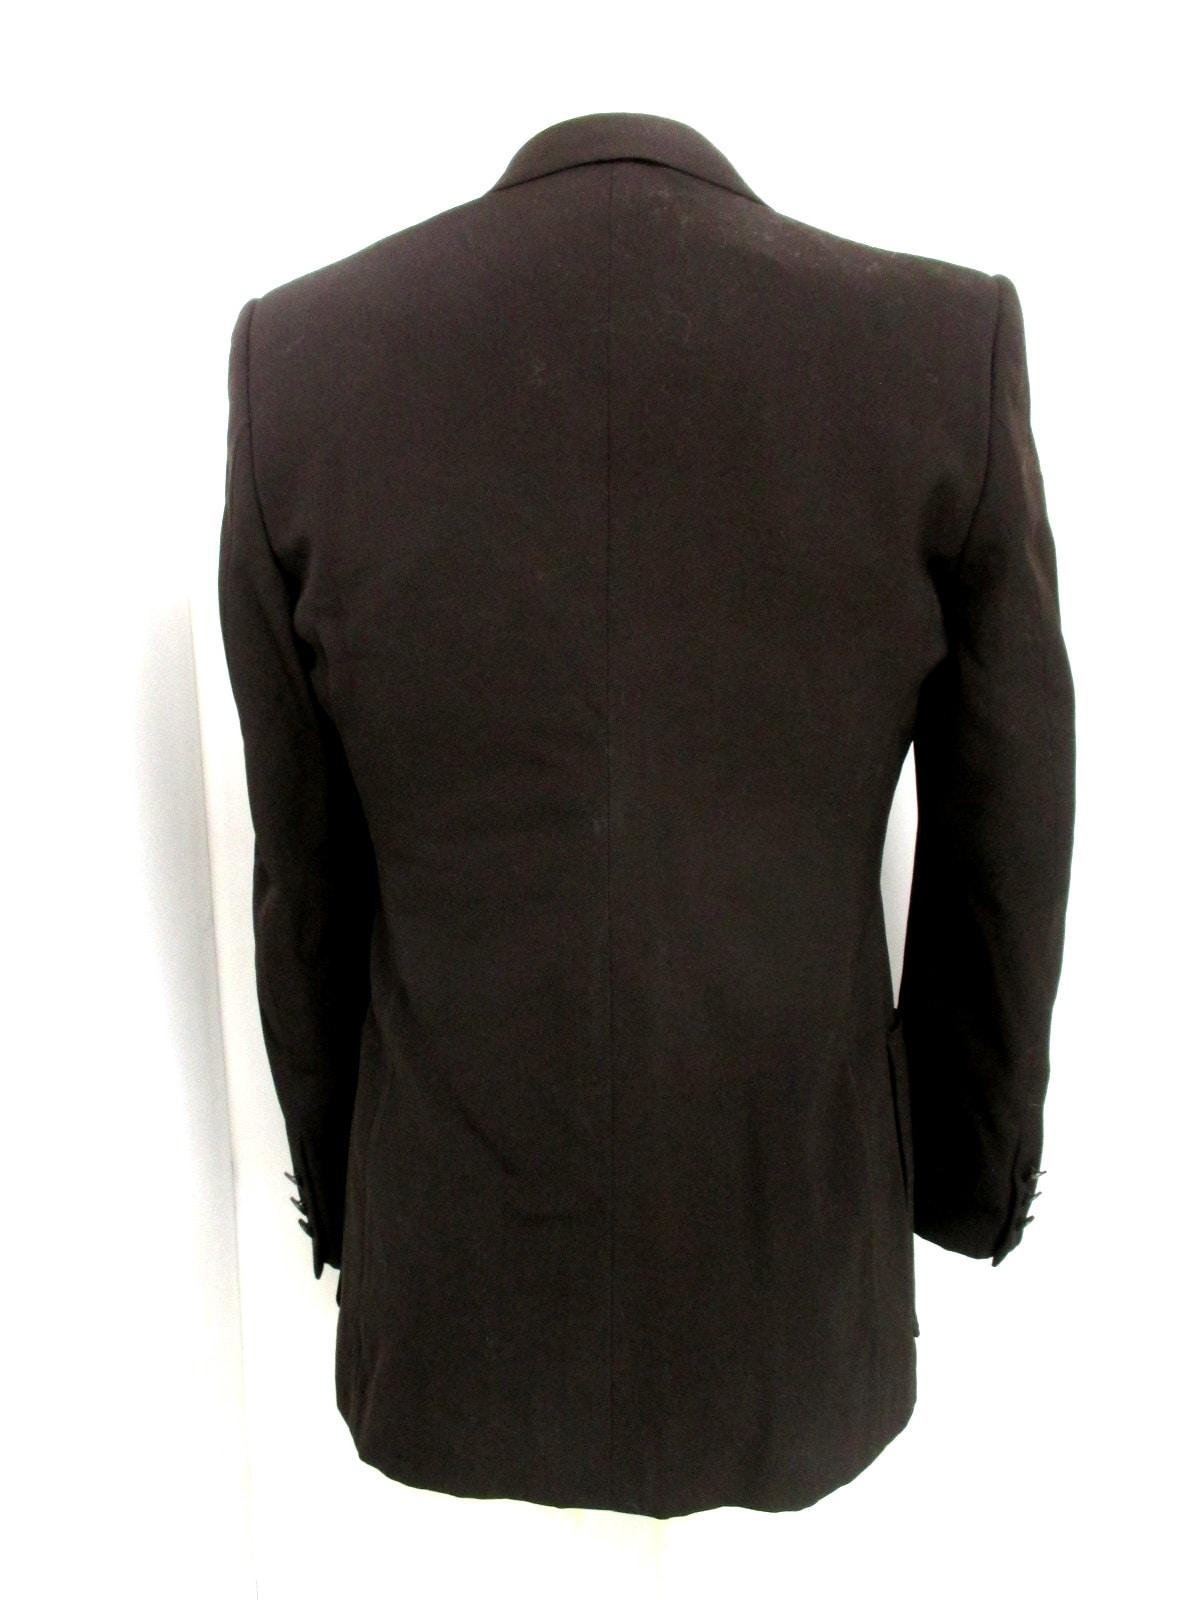 EDWARD'S(エドワーズ)のジャケット